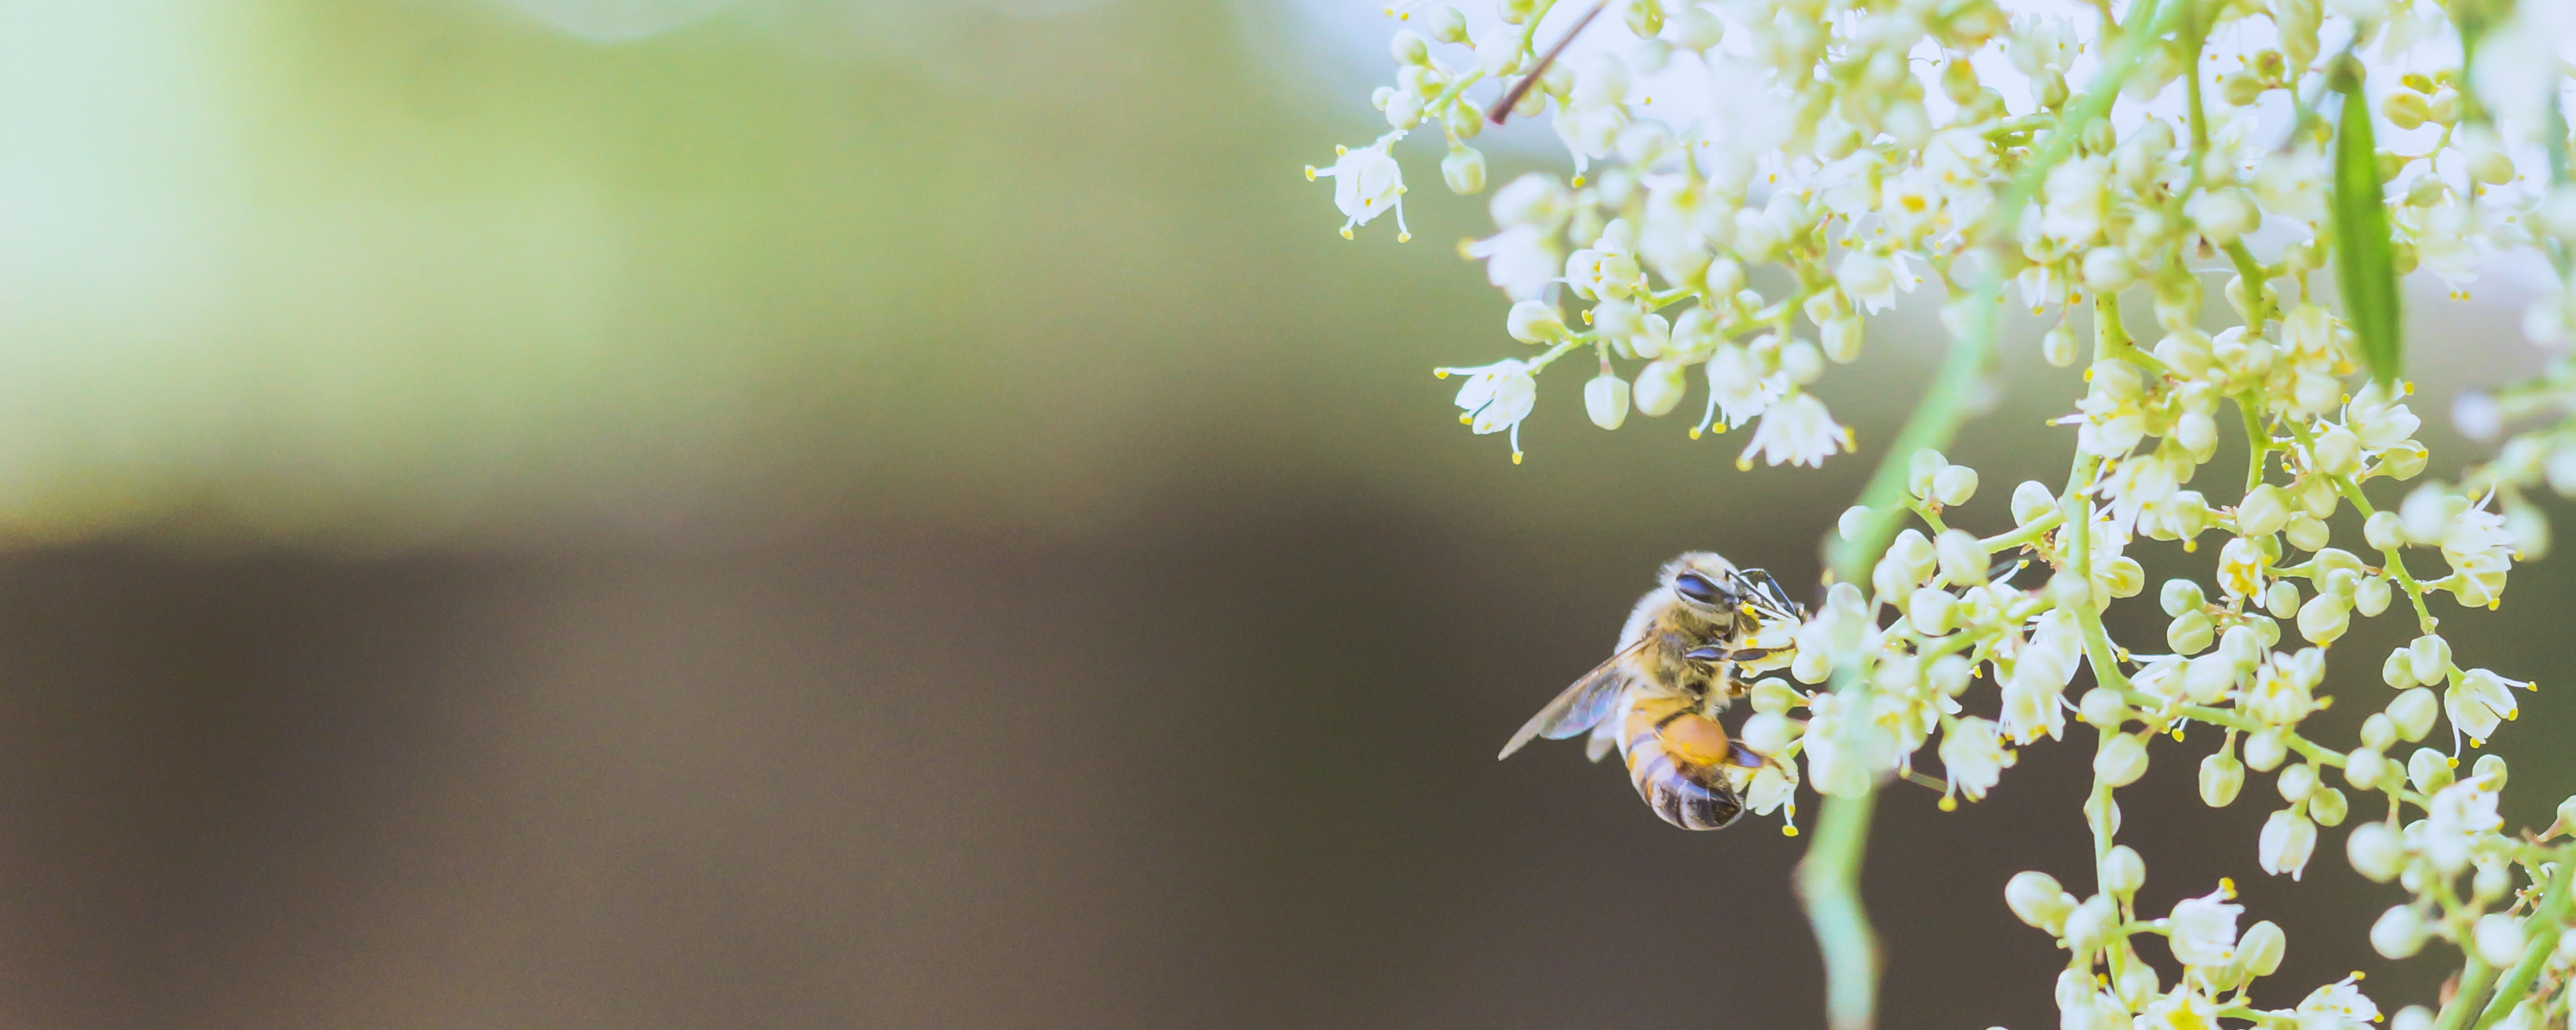 inviting pollination.jpg